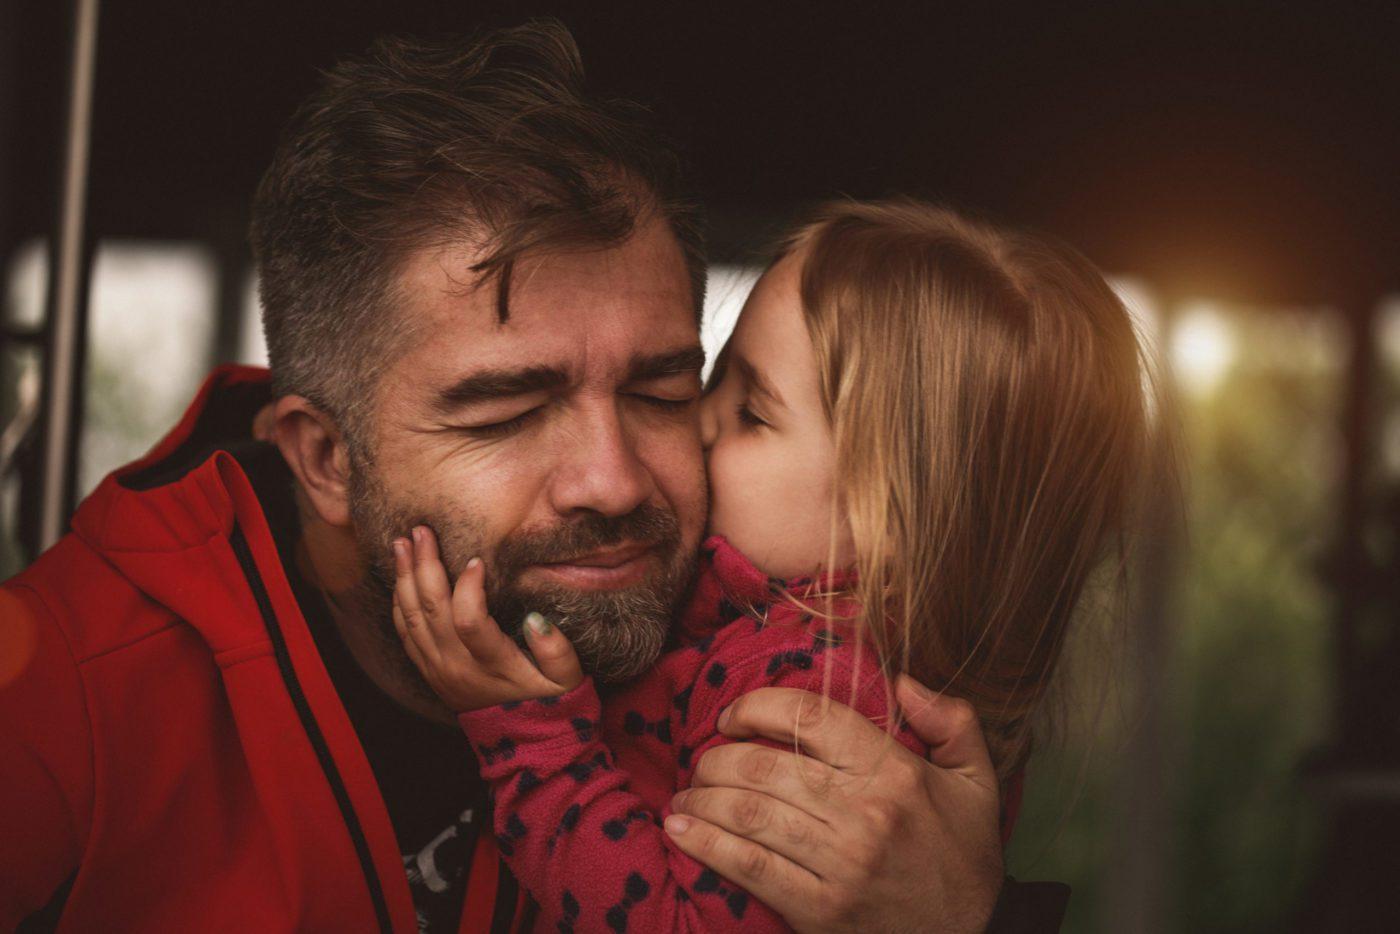 raising a child as a single father